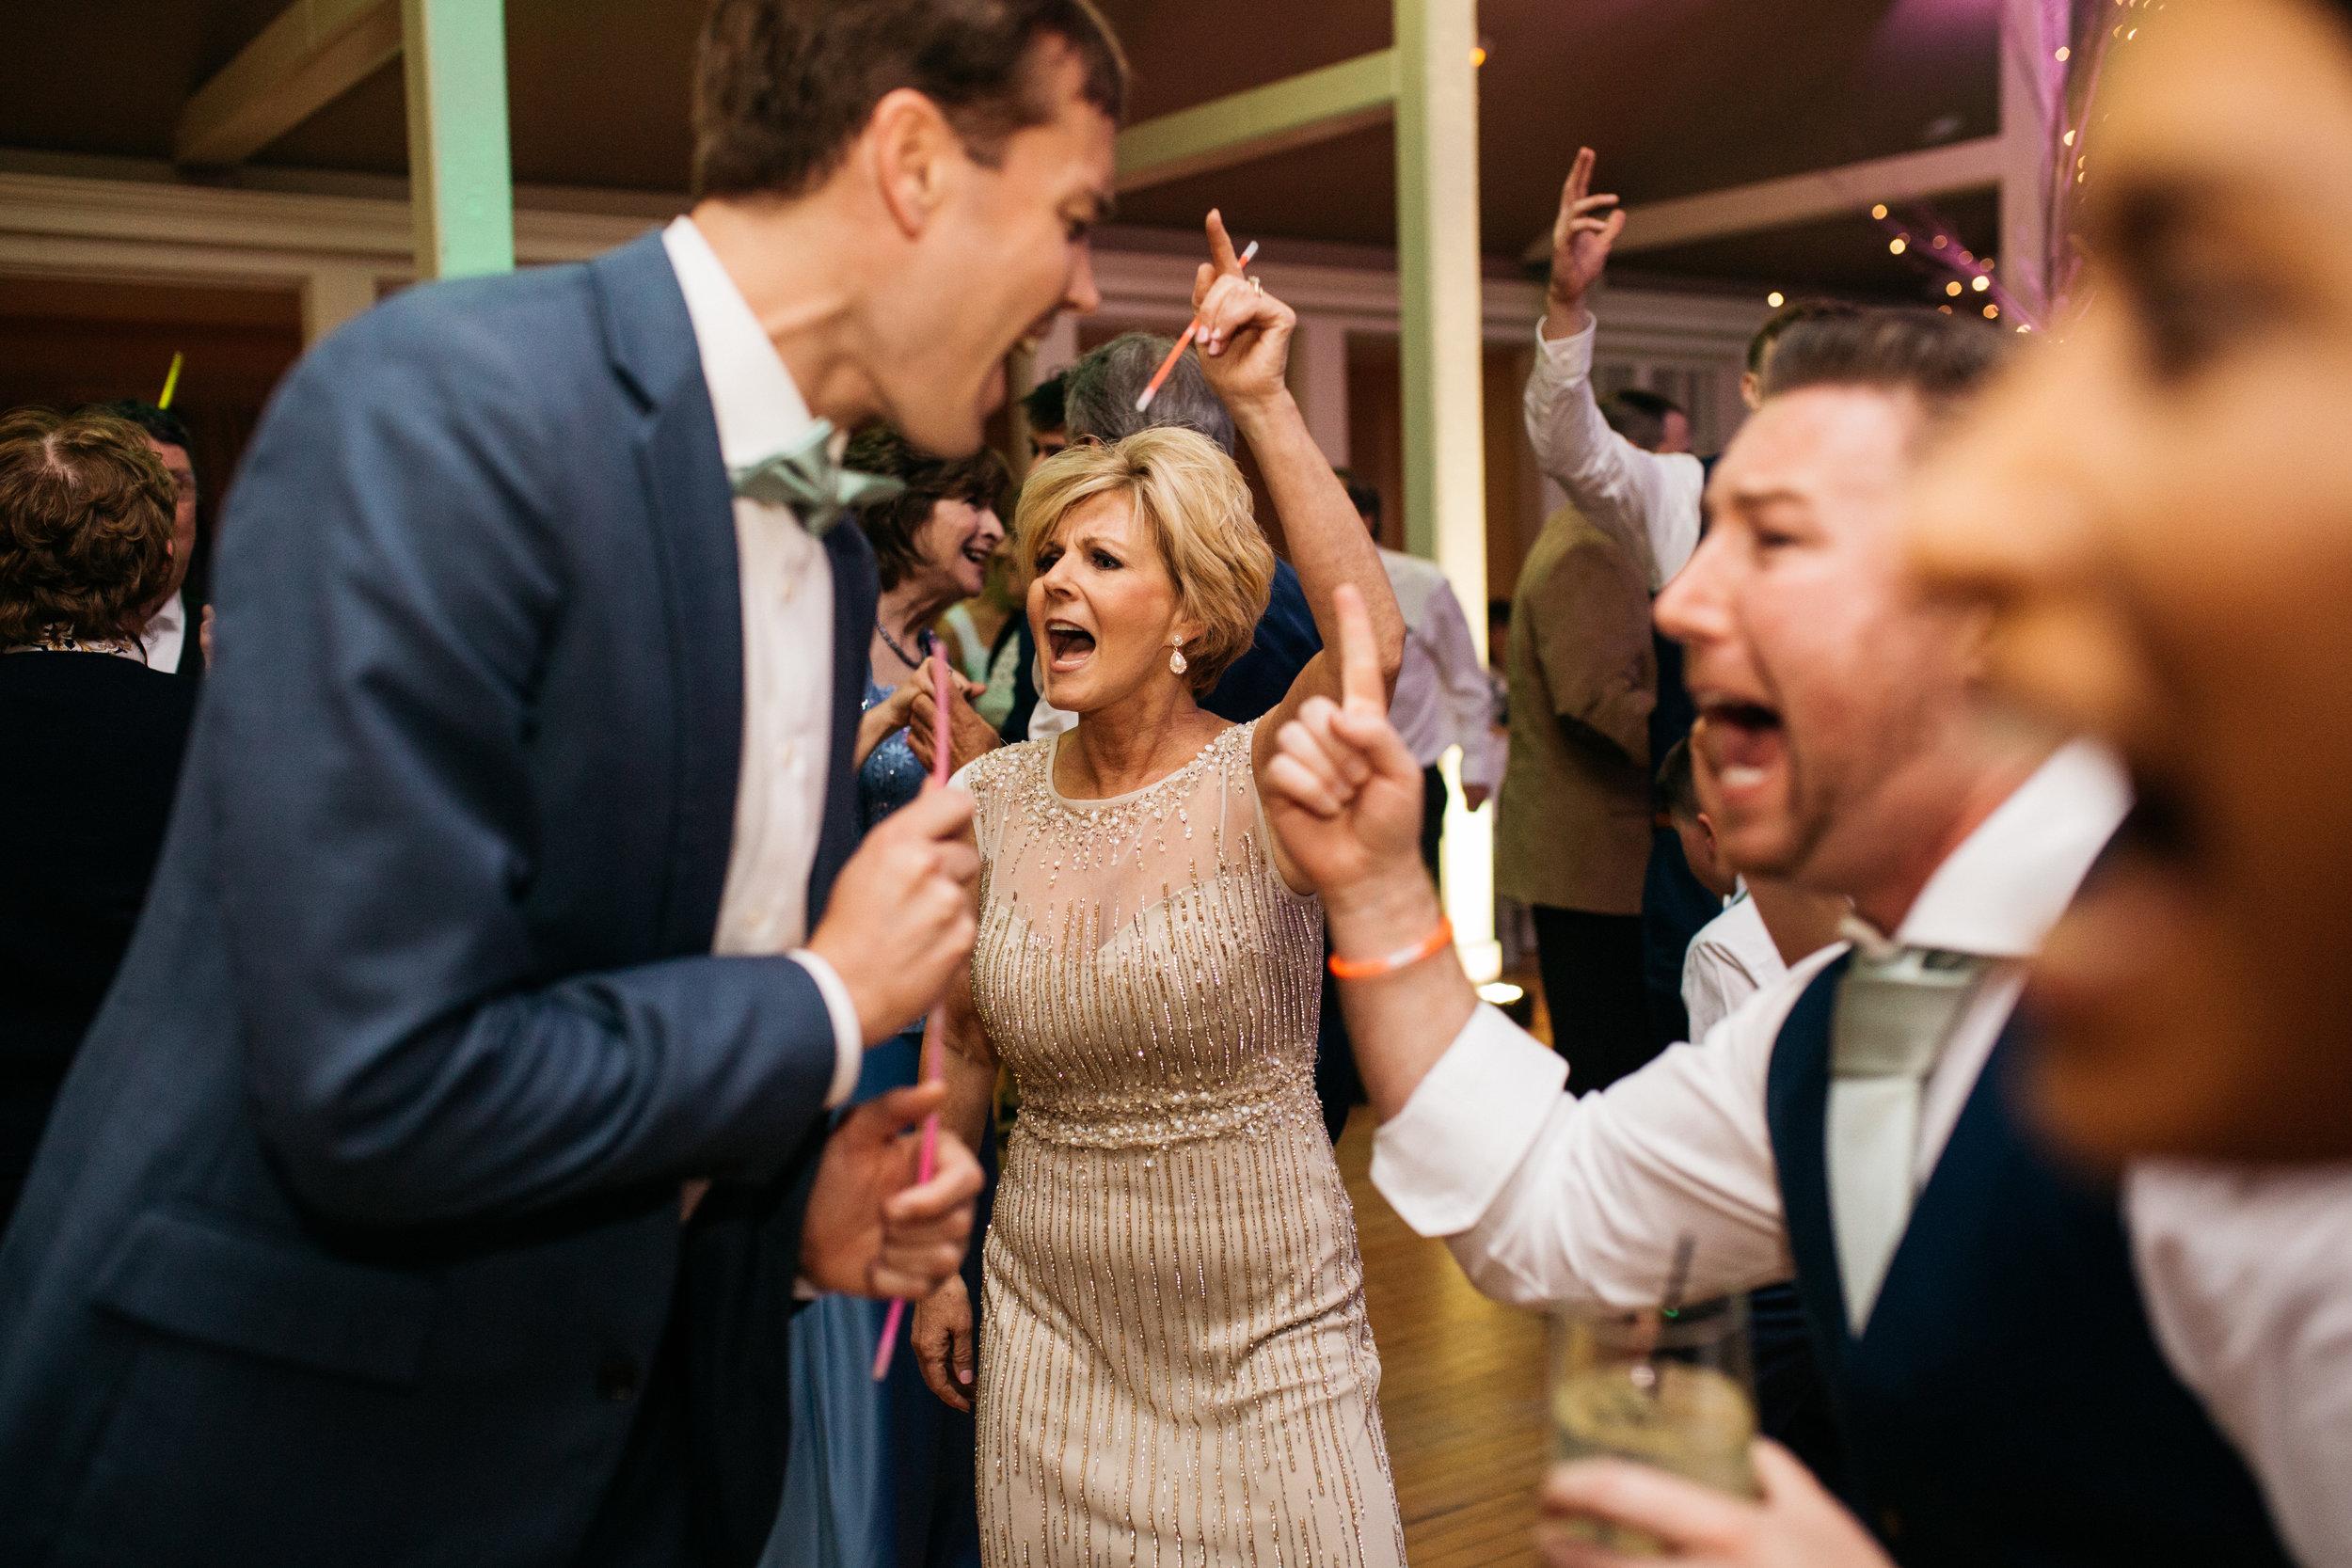 old_daley_on_crooked_lake_wedding_-117.jpg